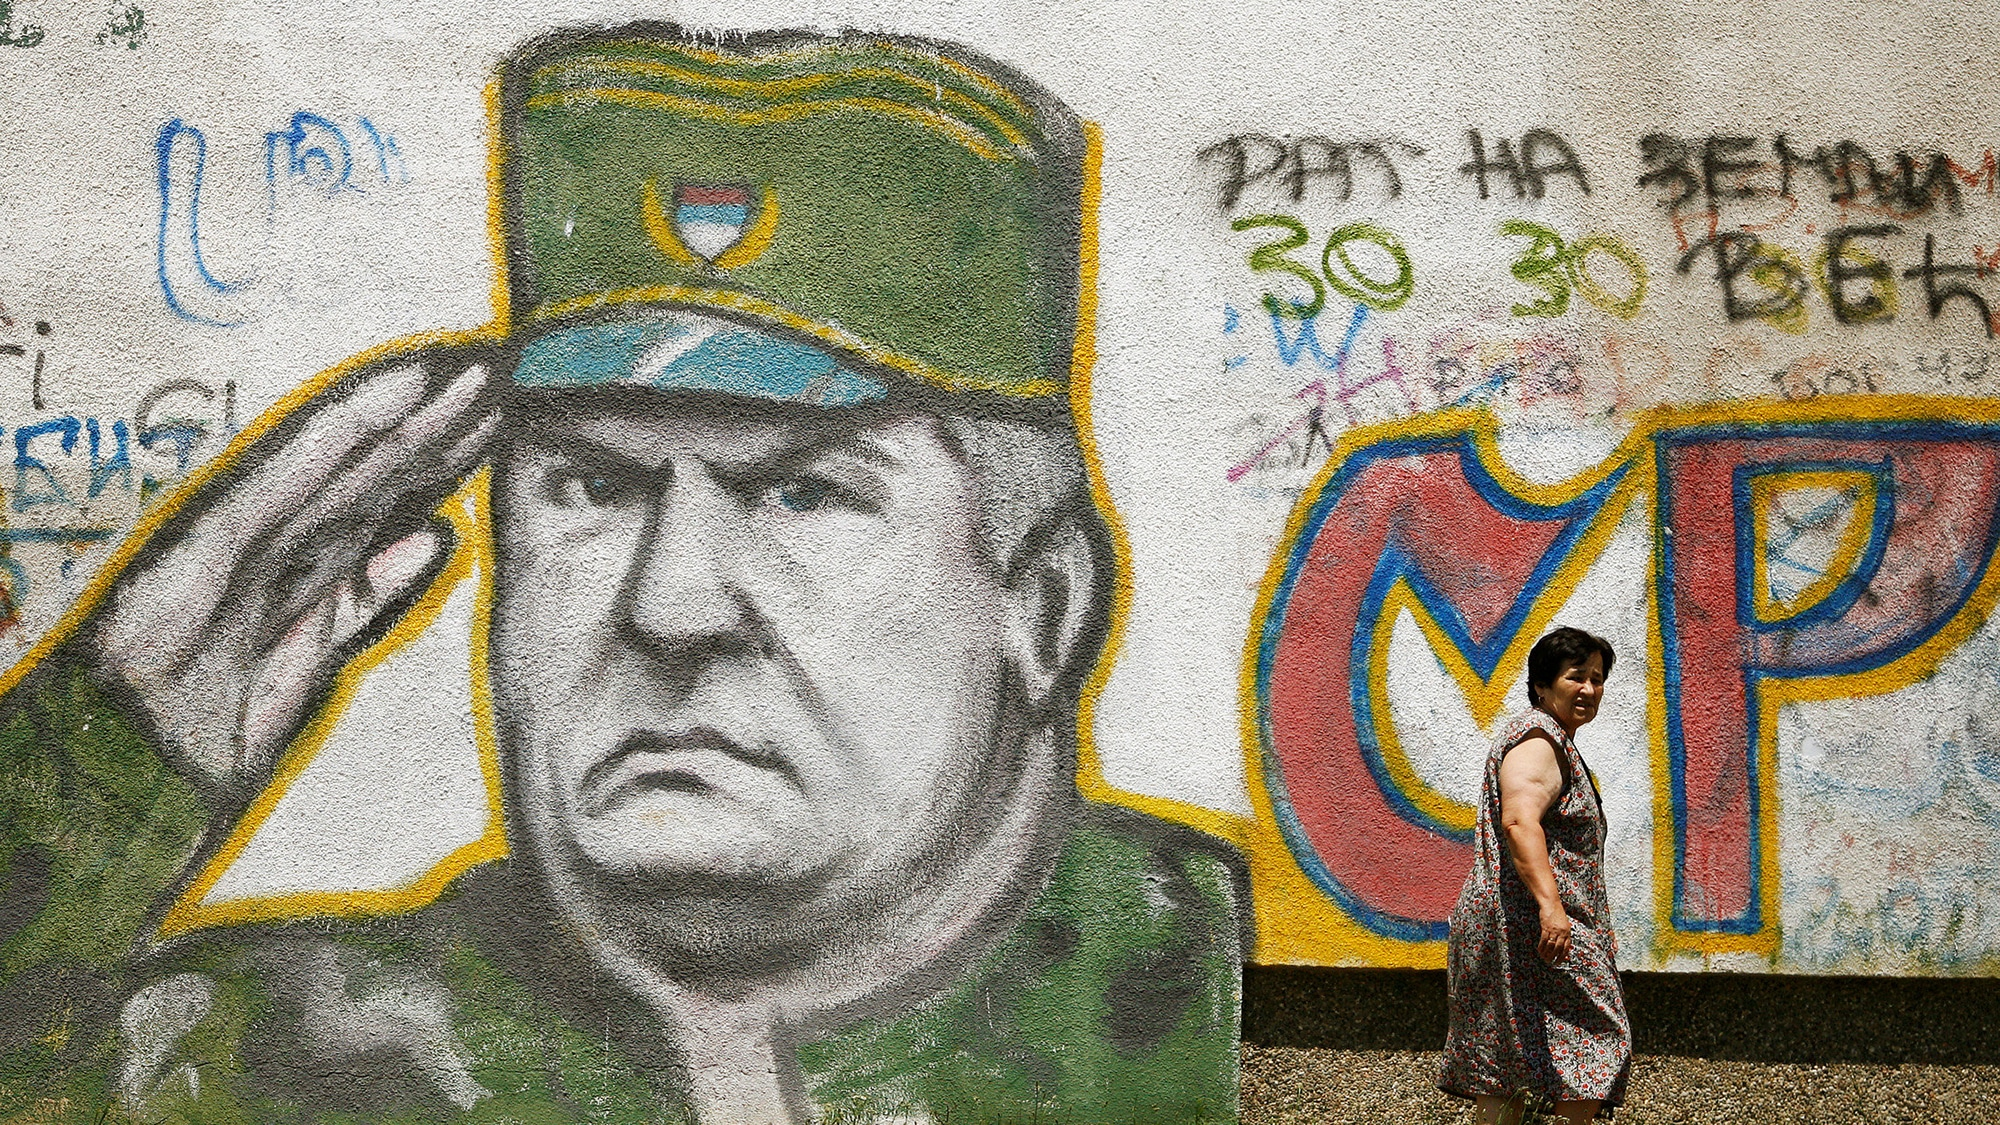 FILE PHOTO: A woman walks past a mural of Bosnian Serb wartime general Ratko Mladic in Belgrade, Serbia June 11, 2009. REUTER